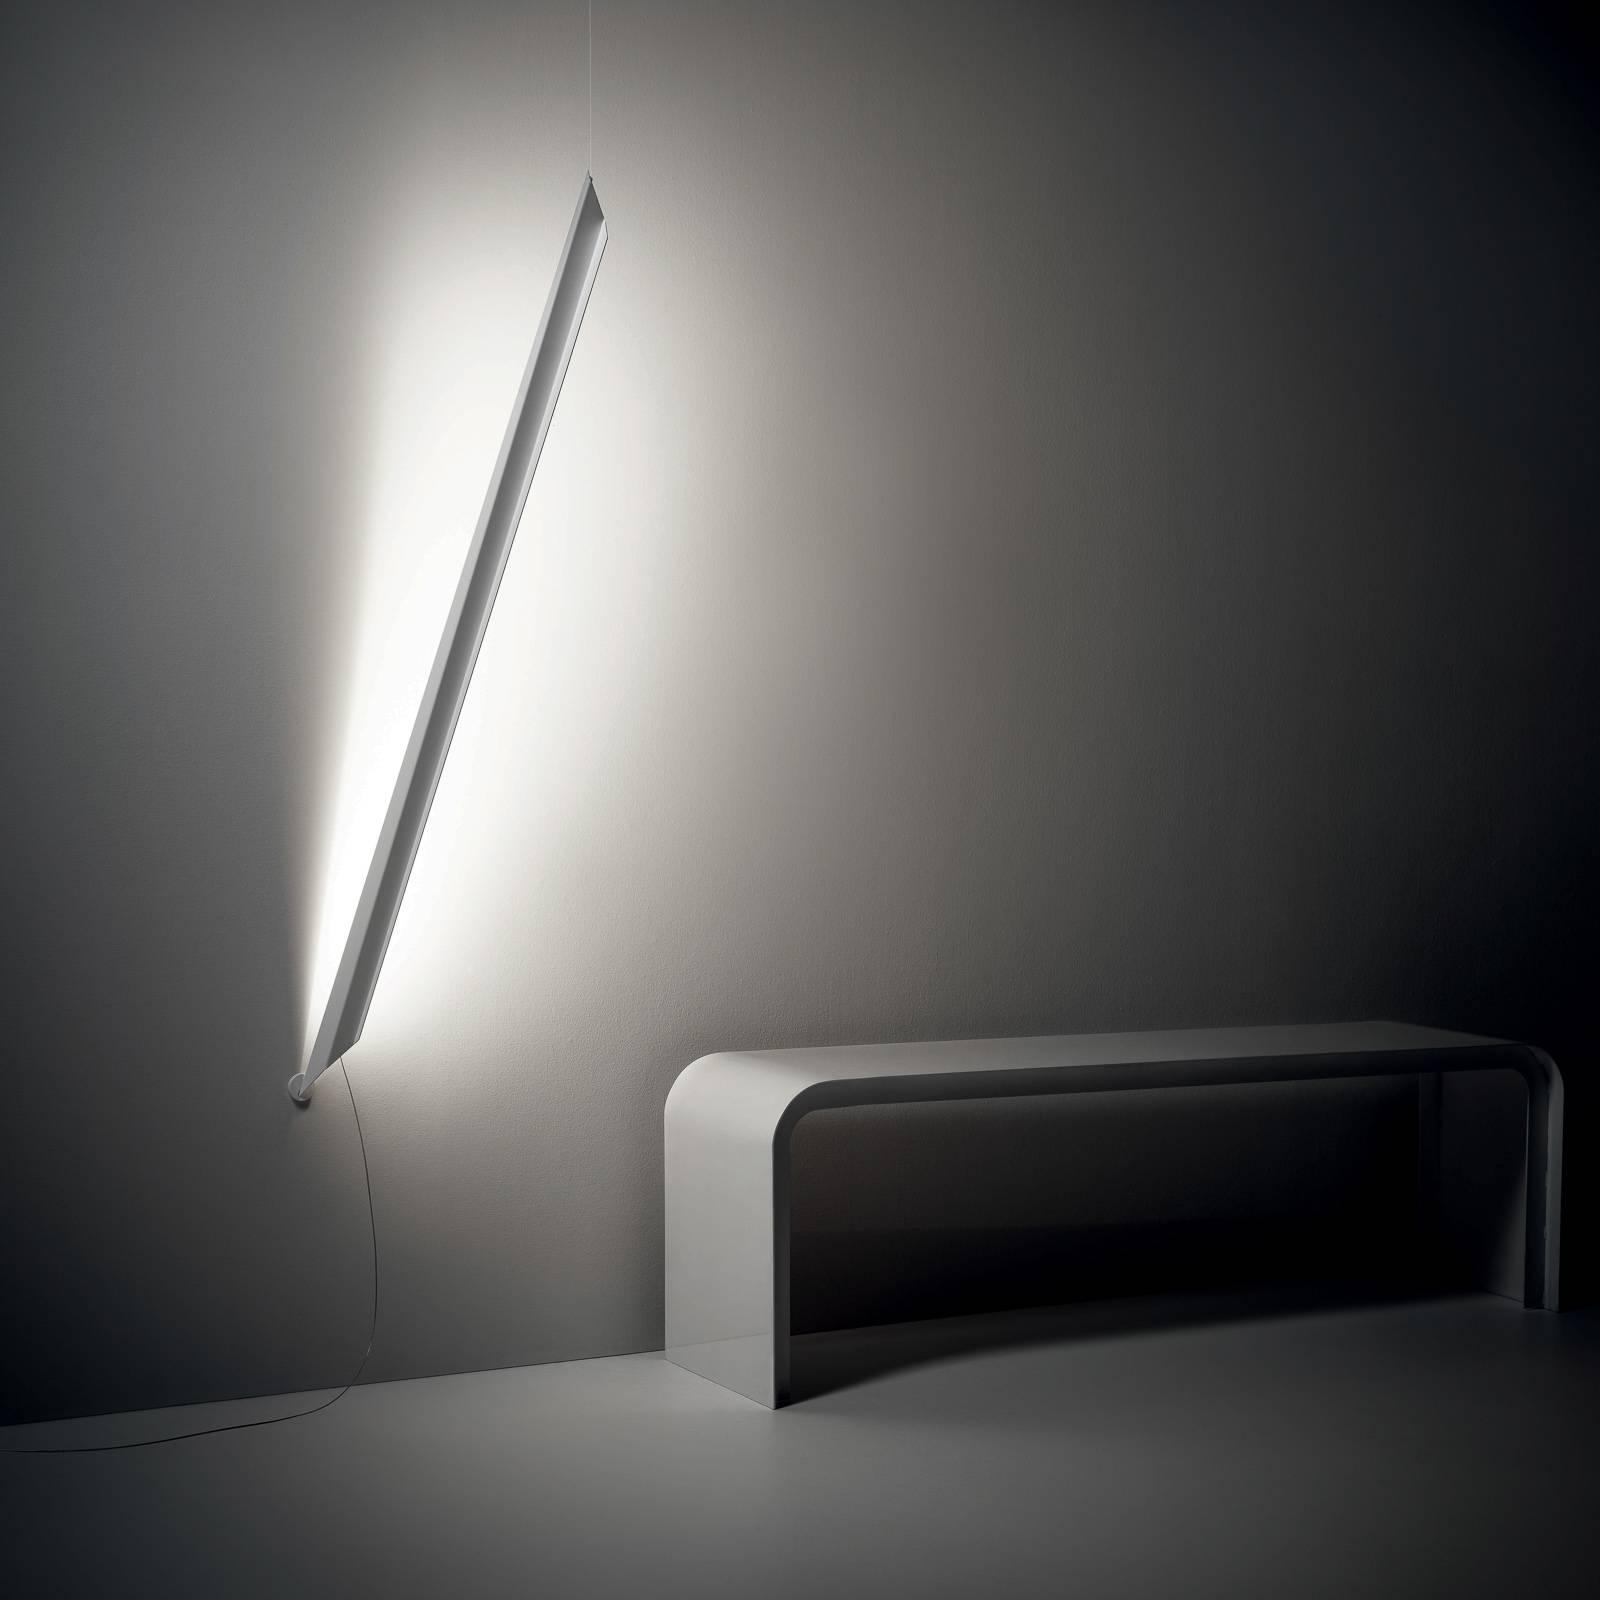 Knikerboker Schegge LED wandlamp, wit